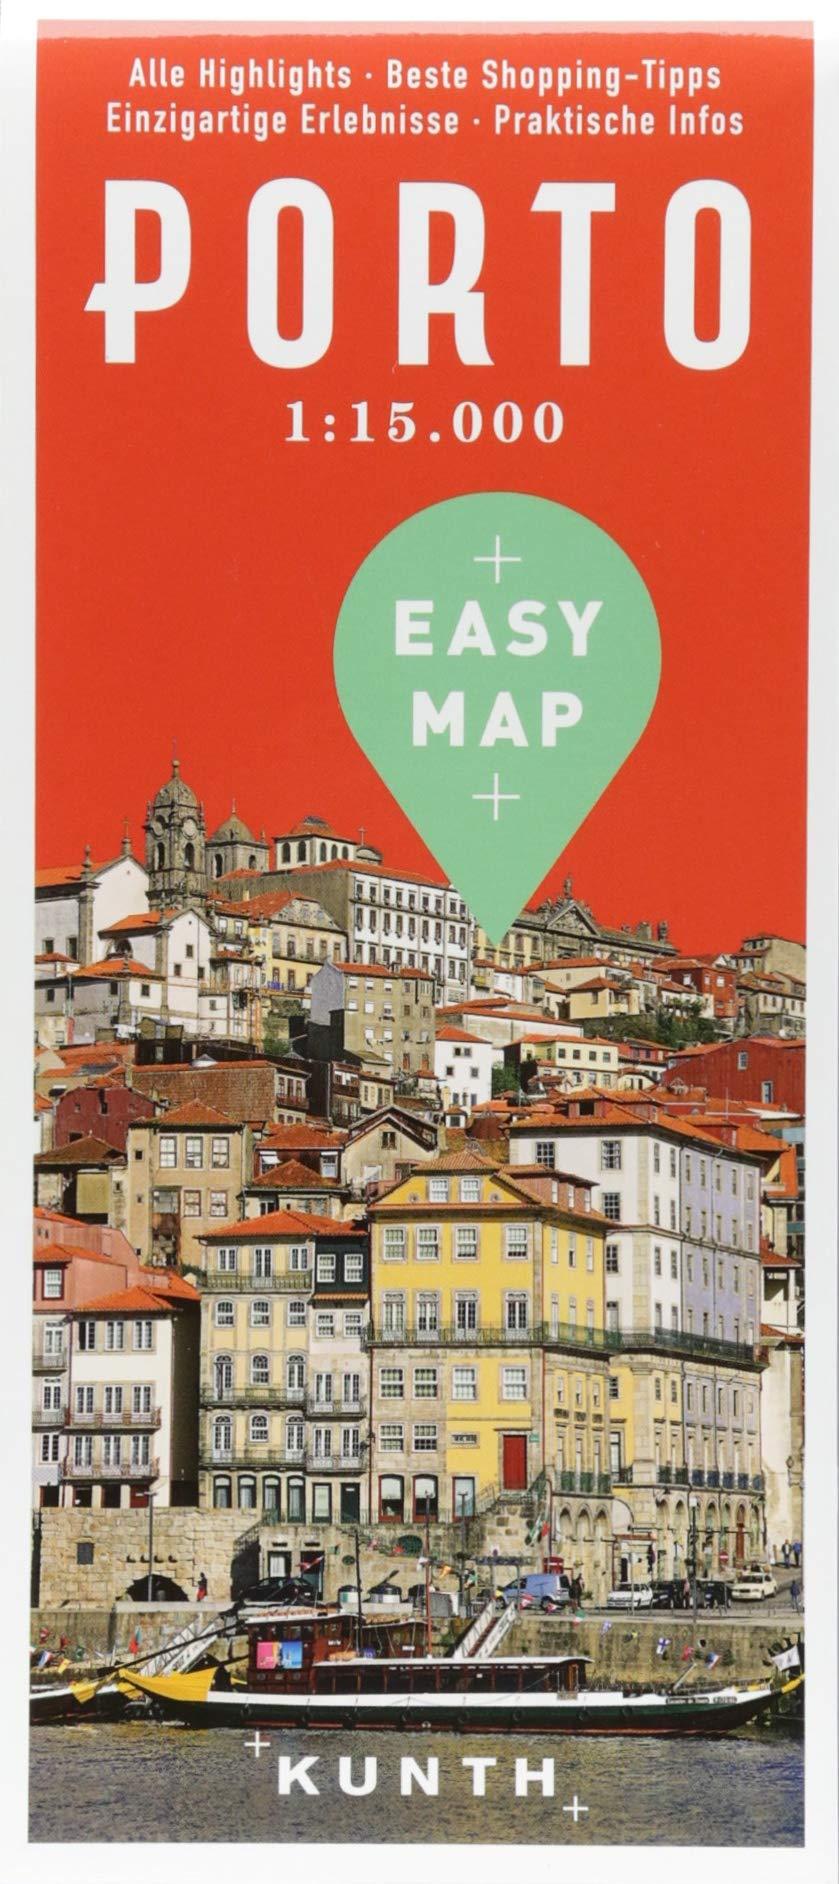 EASY MAP Porto: 1:15.000 (KUNTH EASY MAP) Landkarte – Folded Map, 11. Mai 2018 Kunth Verlag 3955046109 Karten / Stadtpläne / Europa Kartografie - Kartierung